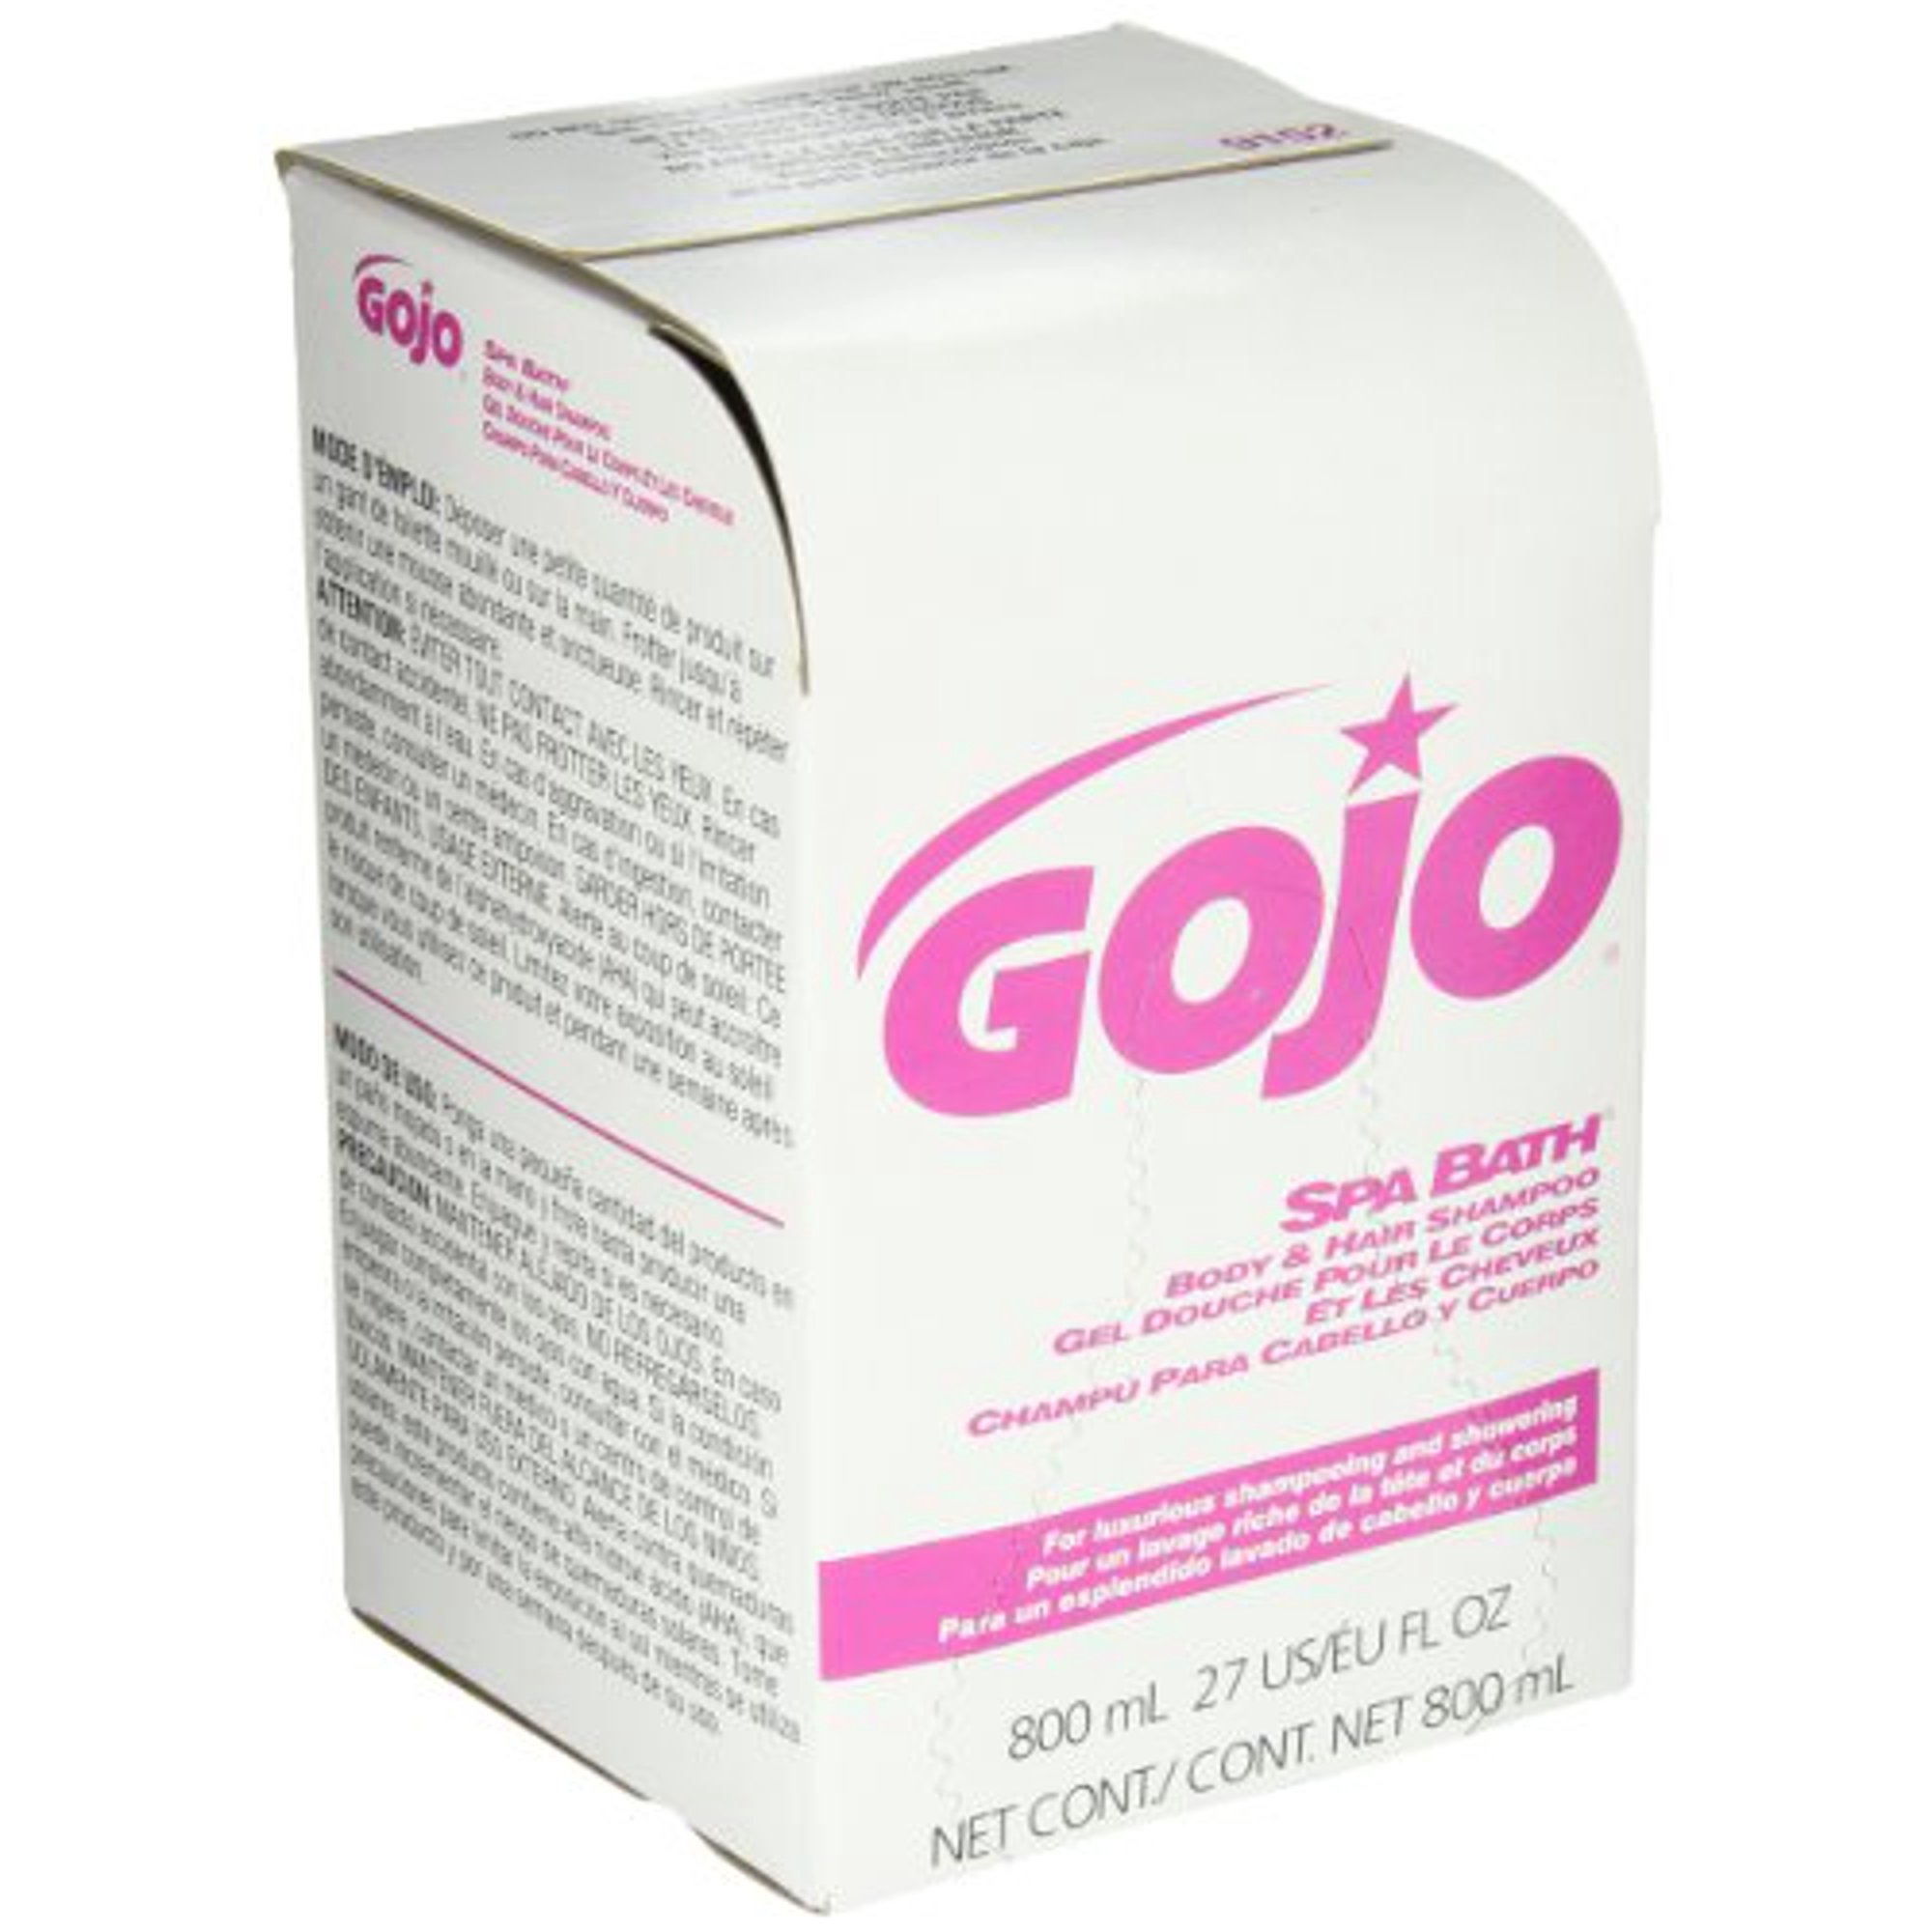 GOJO 800 Series SPA BATH Body and Hair Shampoo, 800 mL SPA BATH